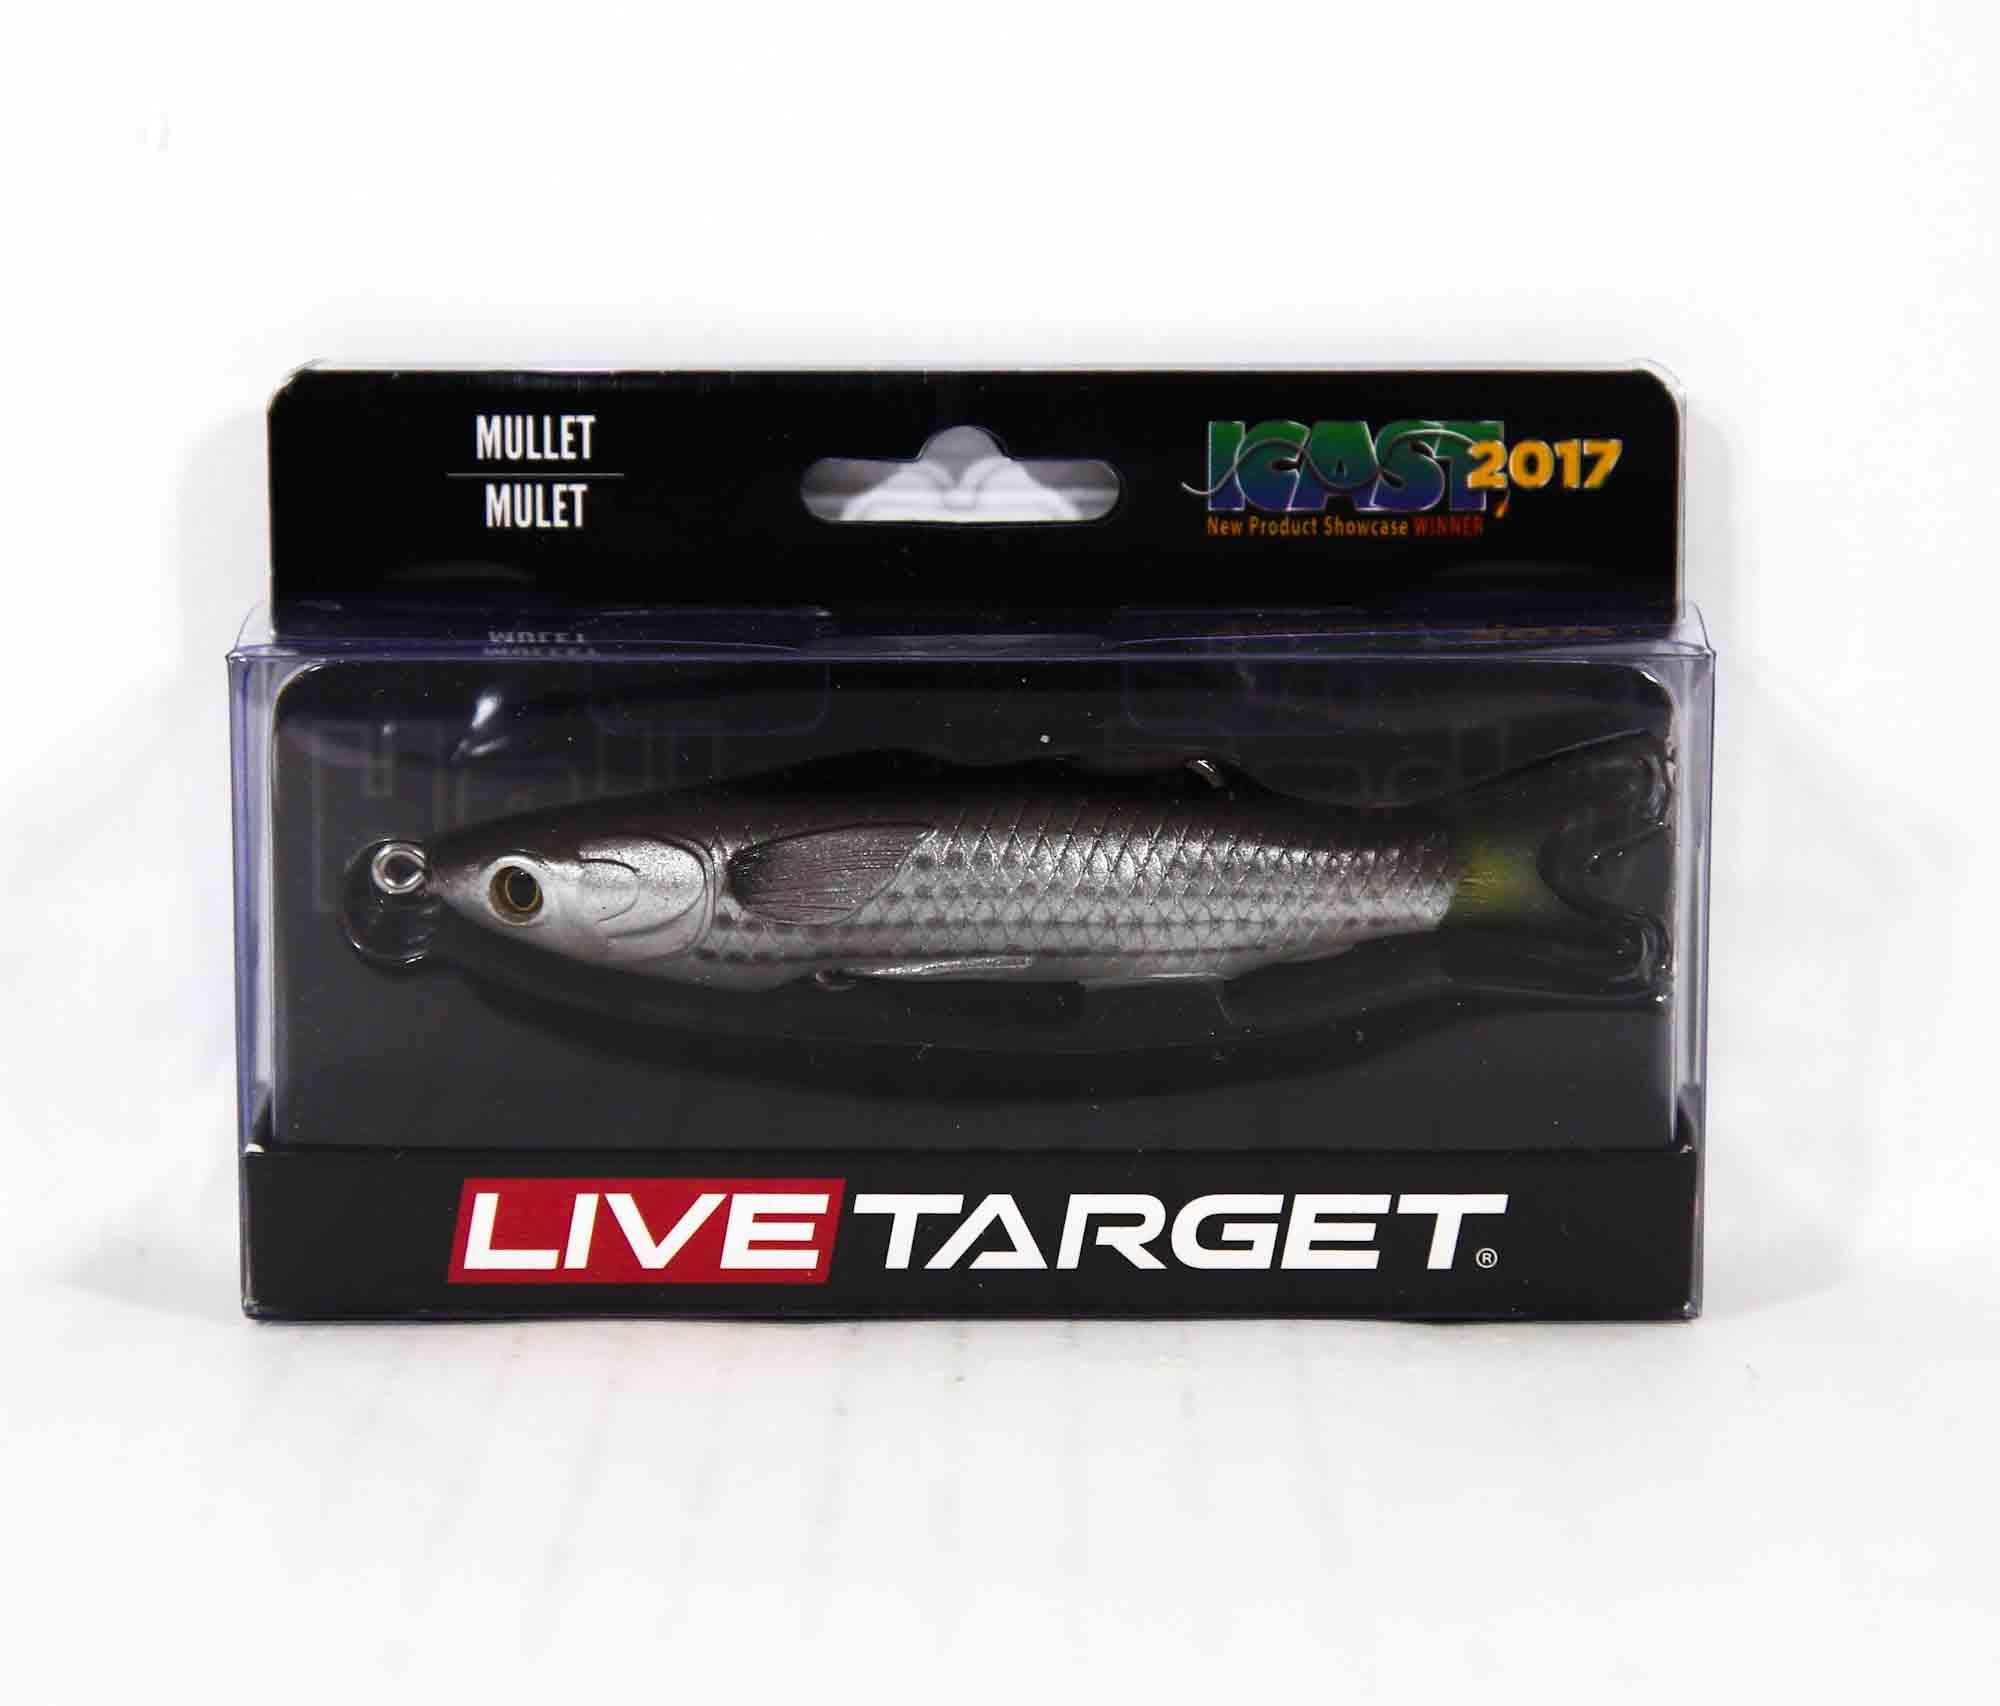 Live Target MUH95T721 Mullet Walking Bait 3.75 Inch Natural Black (0439)